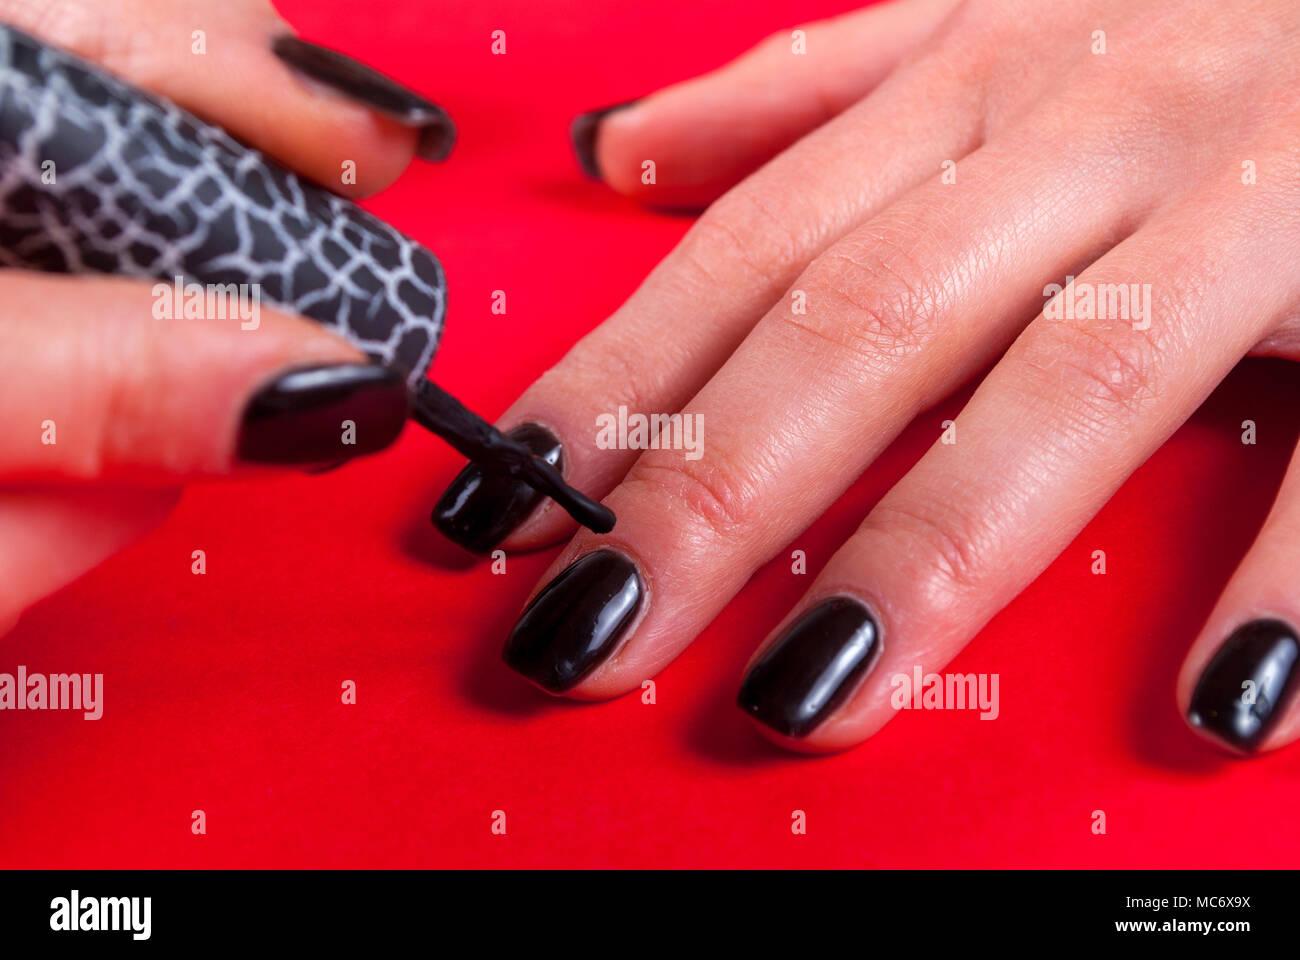 Gel Polish Stockfotos & Gel Polish Bilder - Alamy